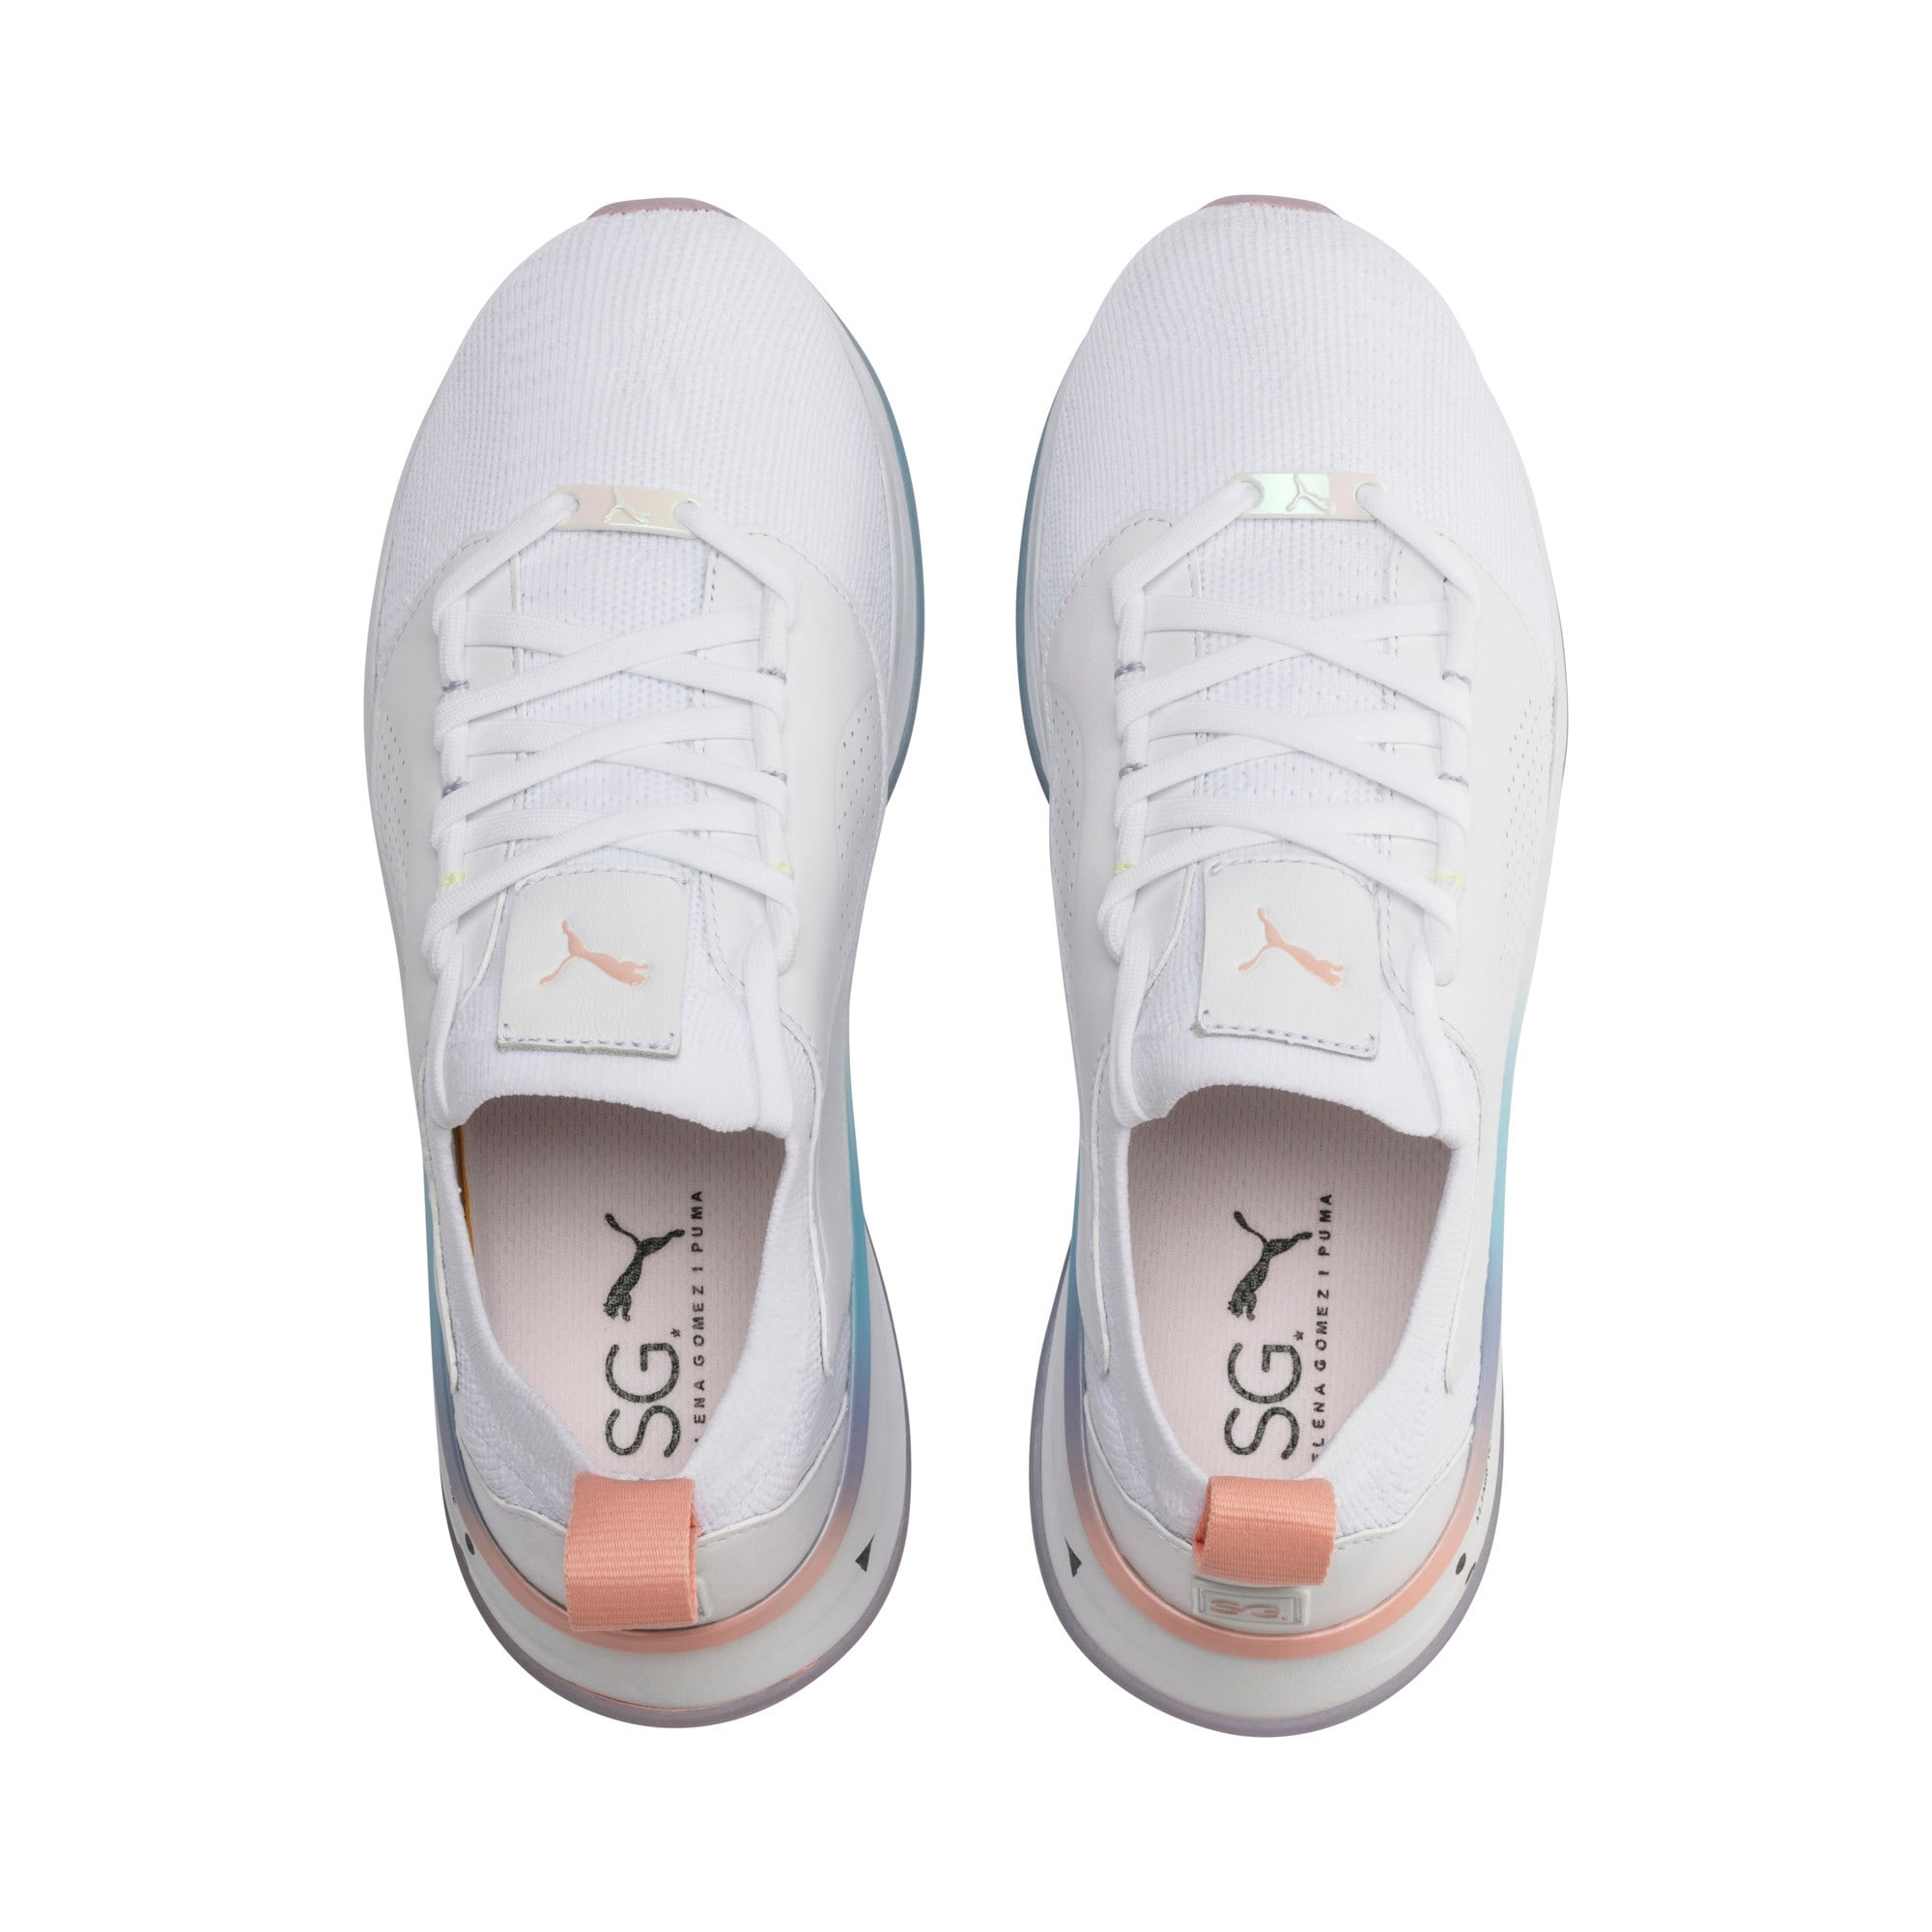 Thumbnail 7 of PUMA x SELENA GOMEZ Runner Women's Training Shoes, Puma White-Peach Bud, medium